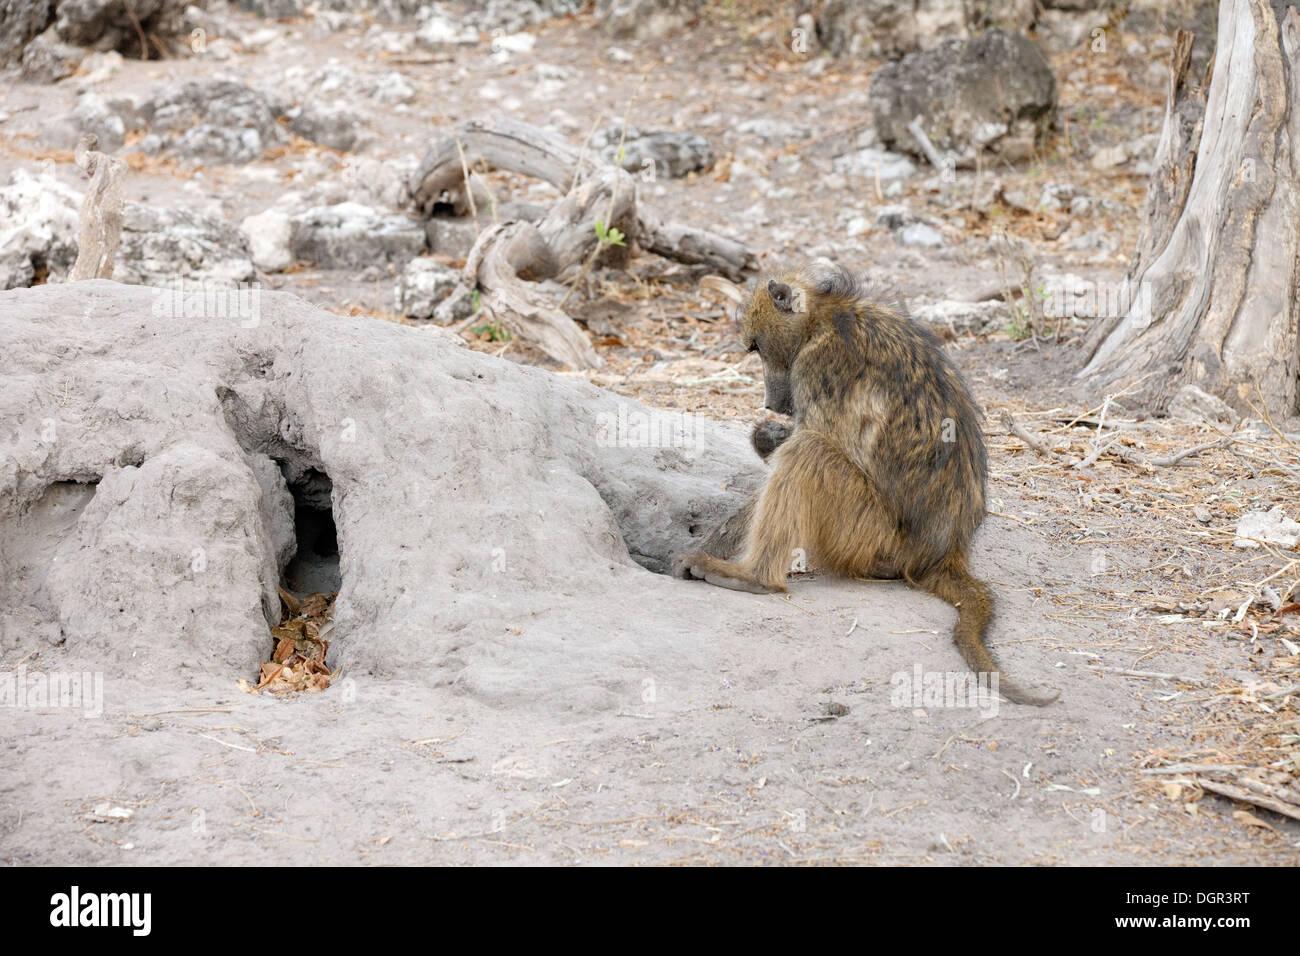 A baboon (  Papio Ursinus ) feeding on termites from a termite mound, Chobe National park, Botswana, Africa - Stock Image